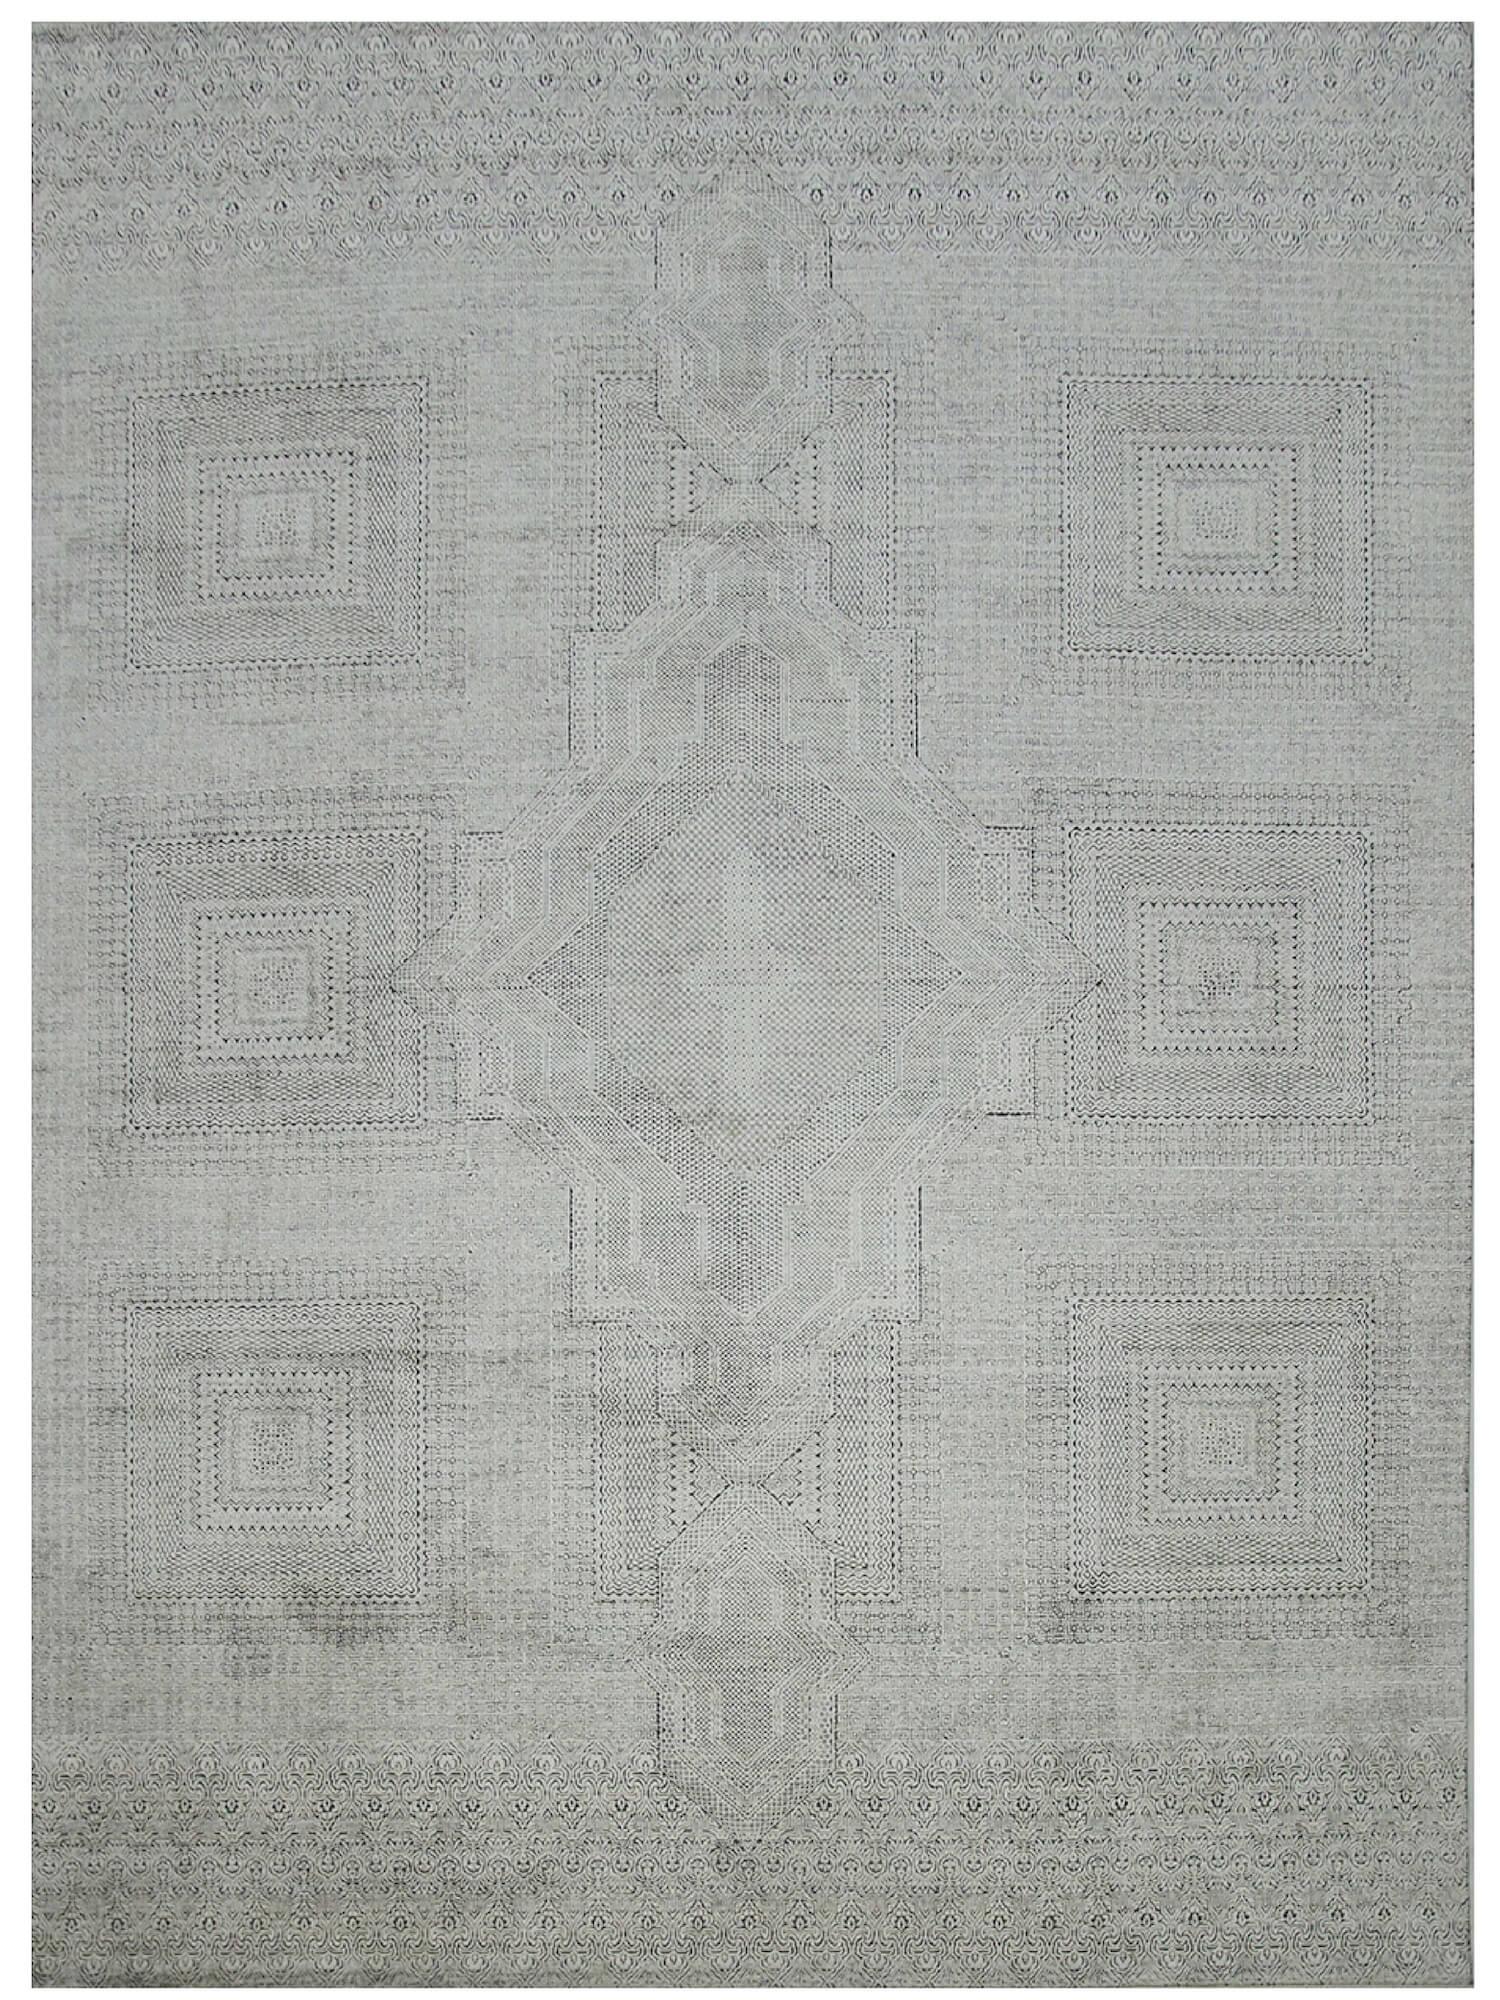 est living Nouveau Orient rug behruz studio editorial 01 1